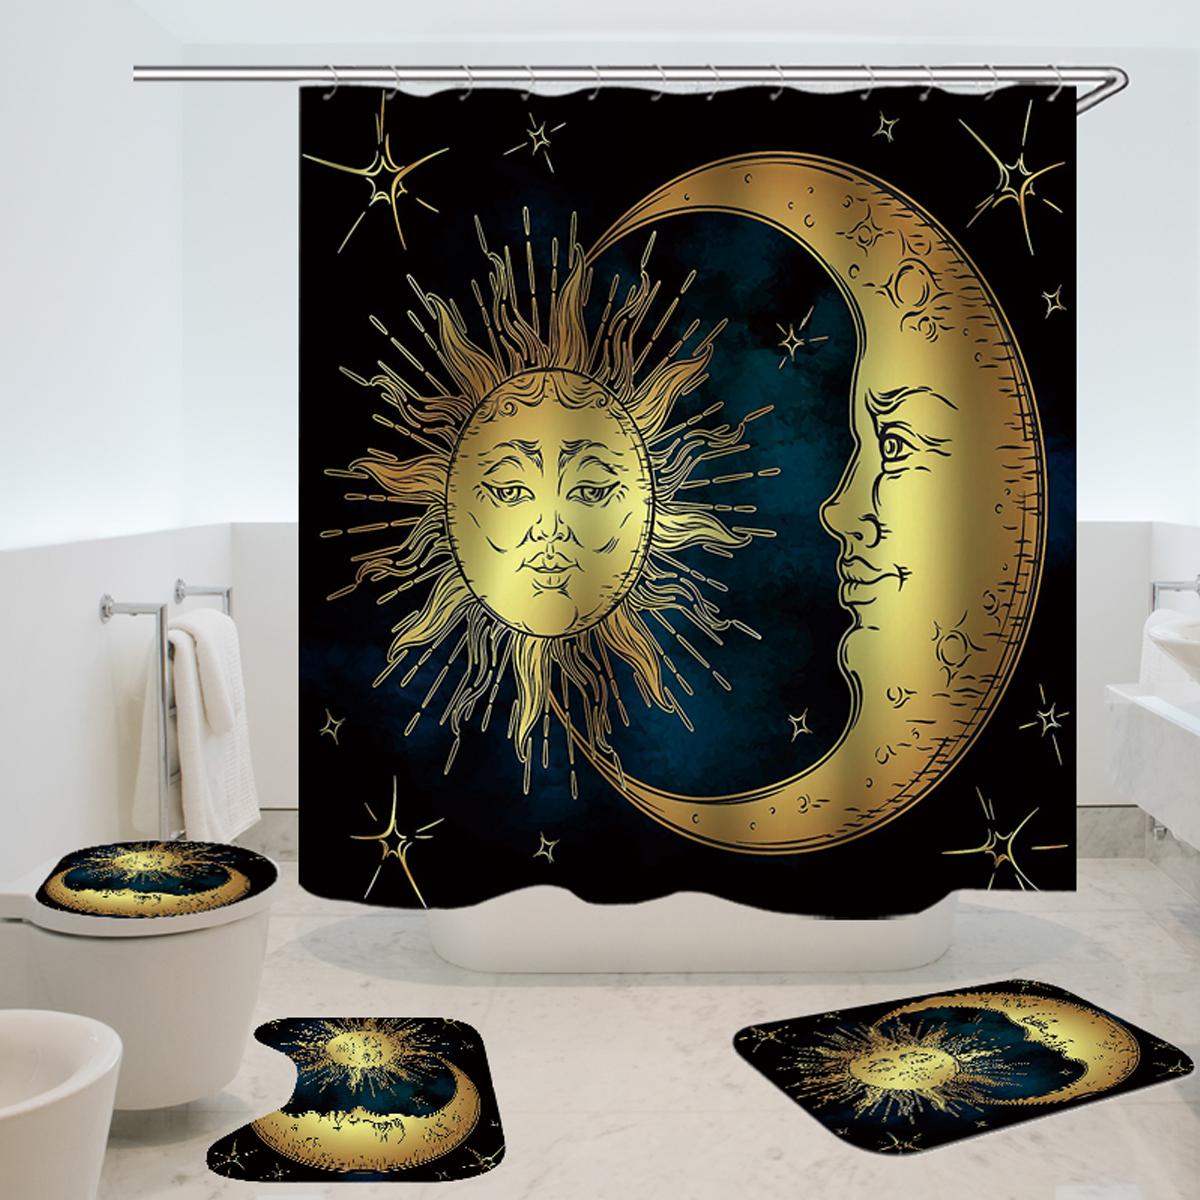 Details About 180x180cm Sun God Bathroom Shower Curtain Toliet Mat Waterproof With 12 Hooks